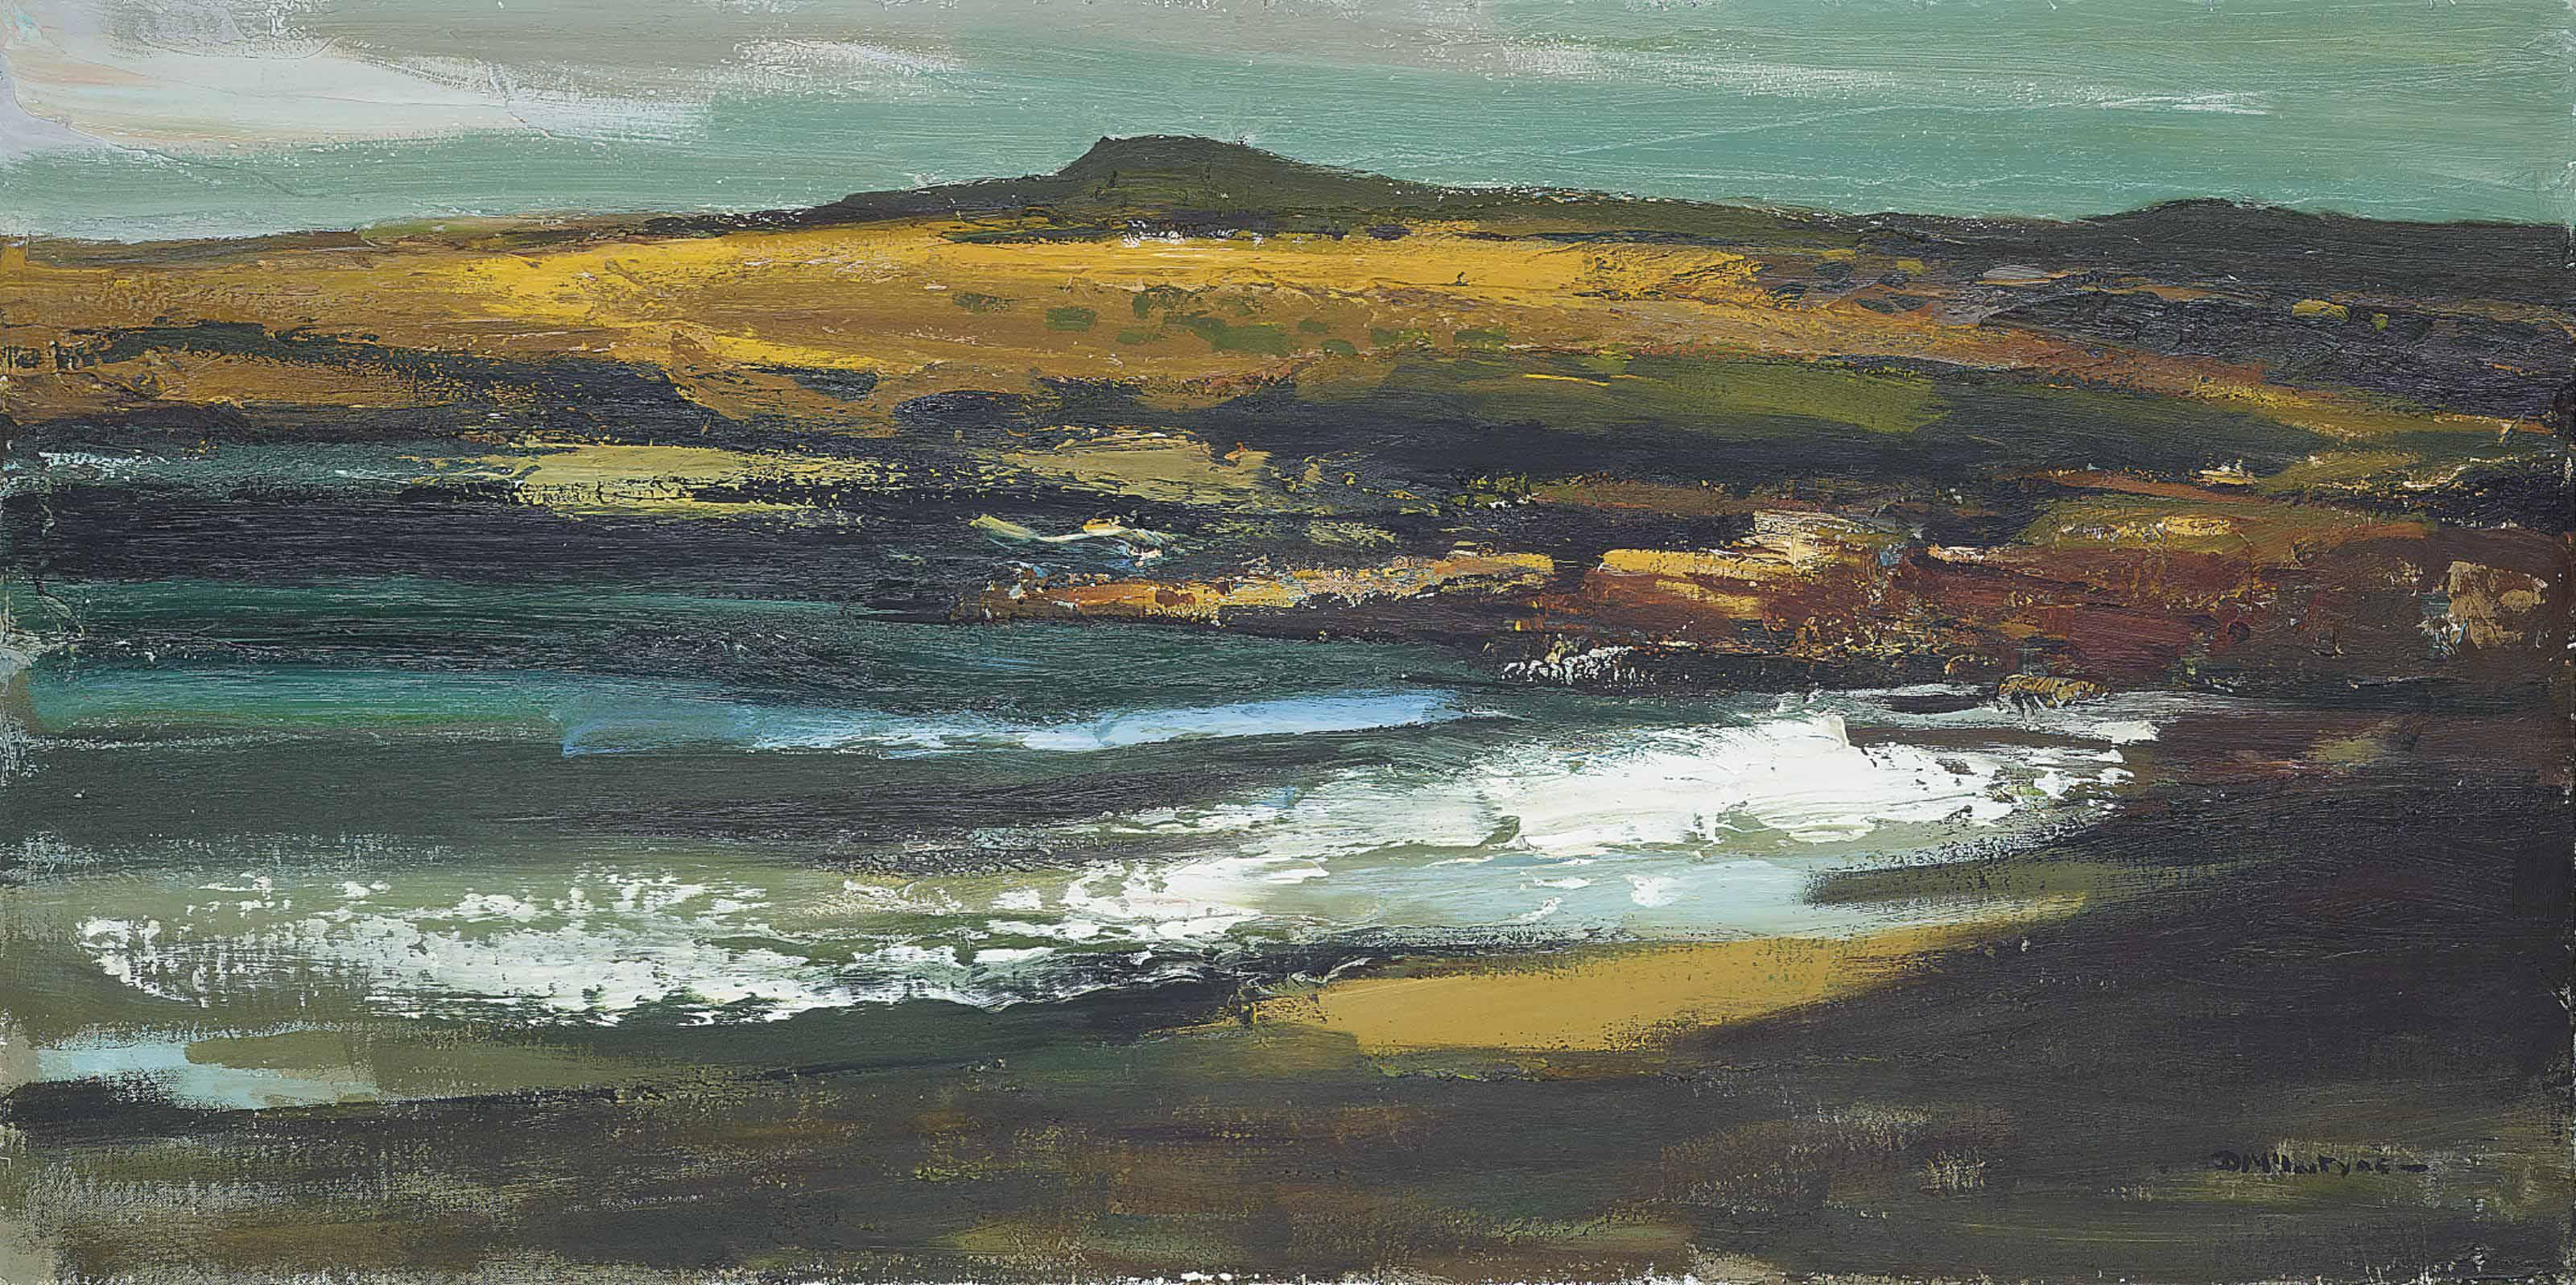 The Wave, Porth Cwyfan